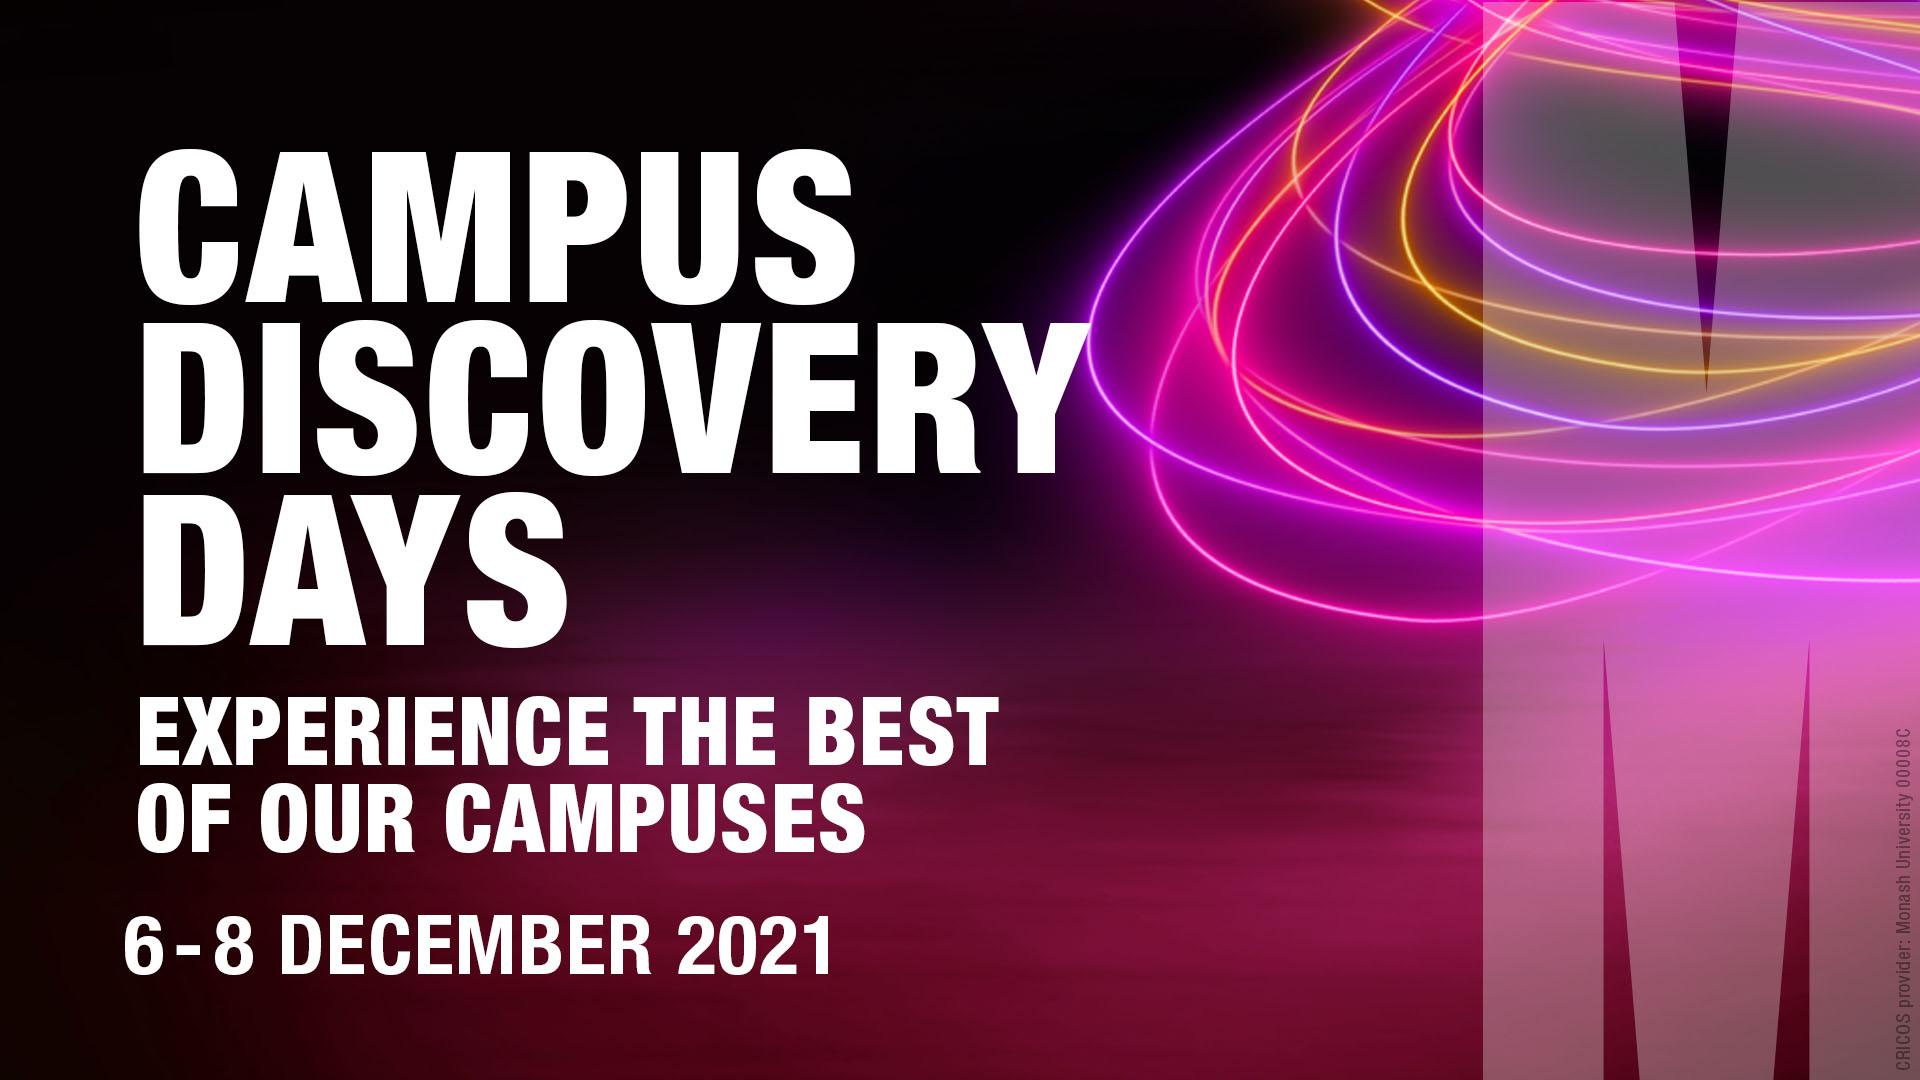 Campus Discovery Days Campus Discovery Days